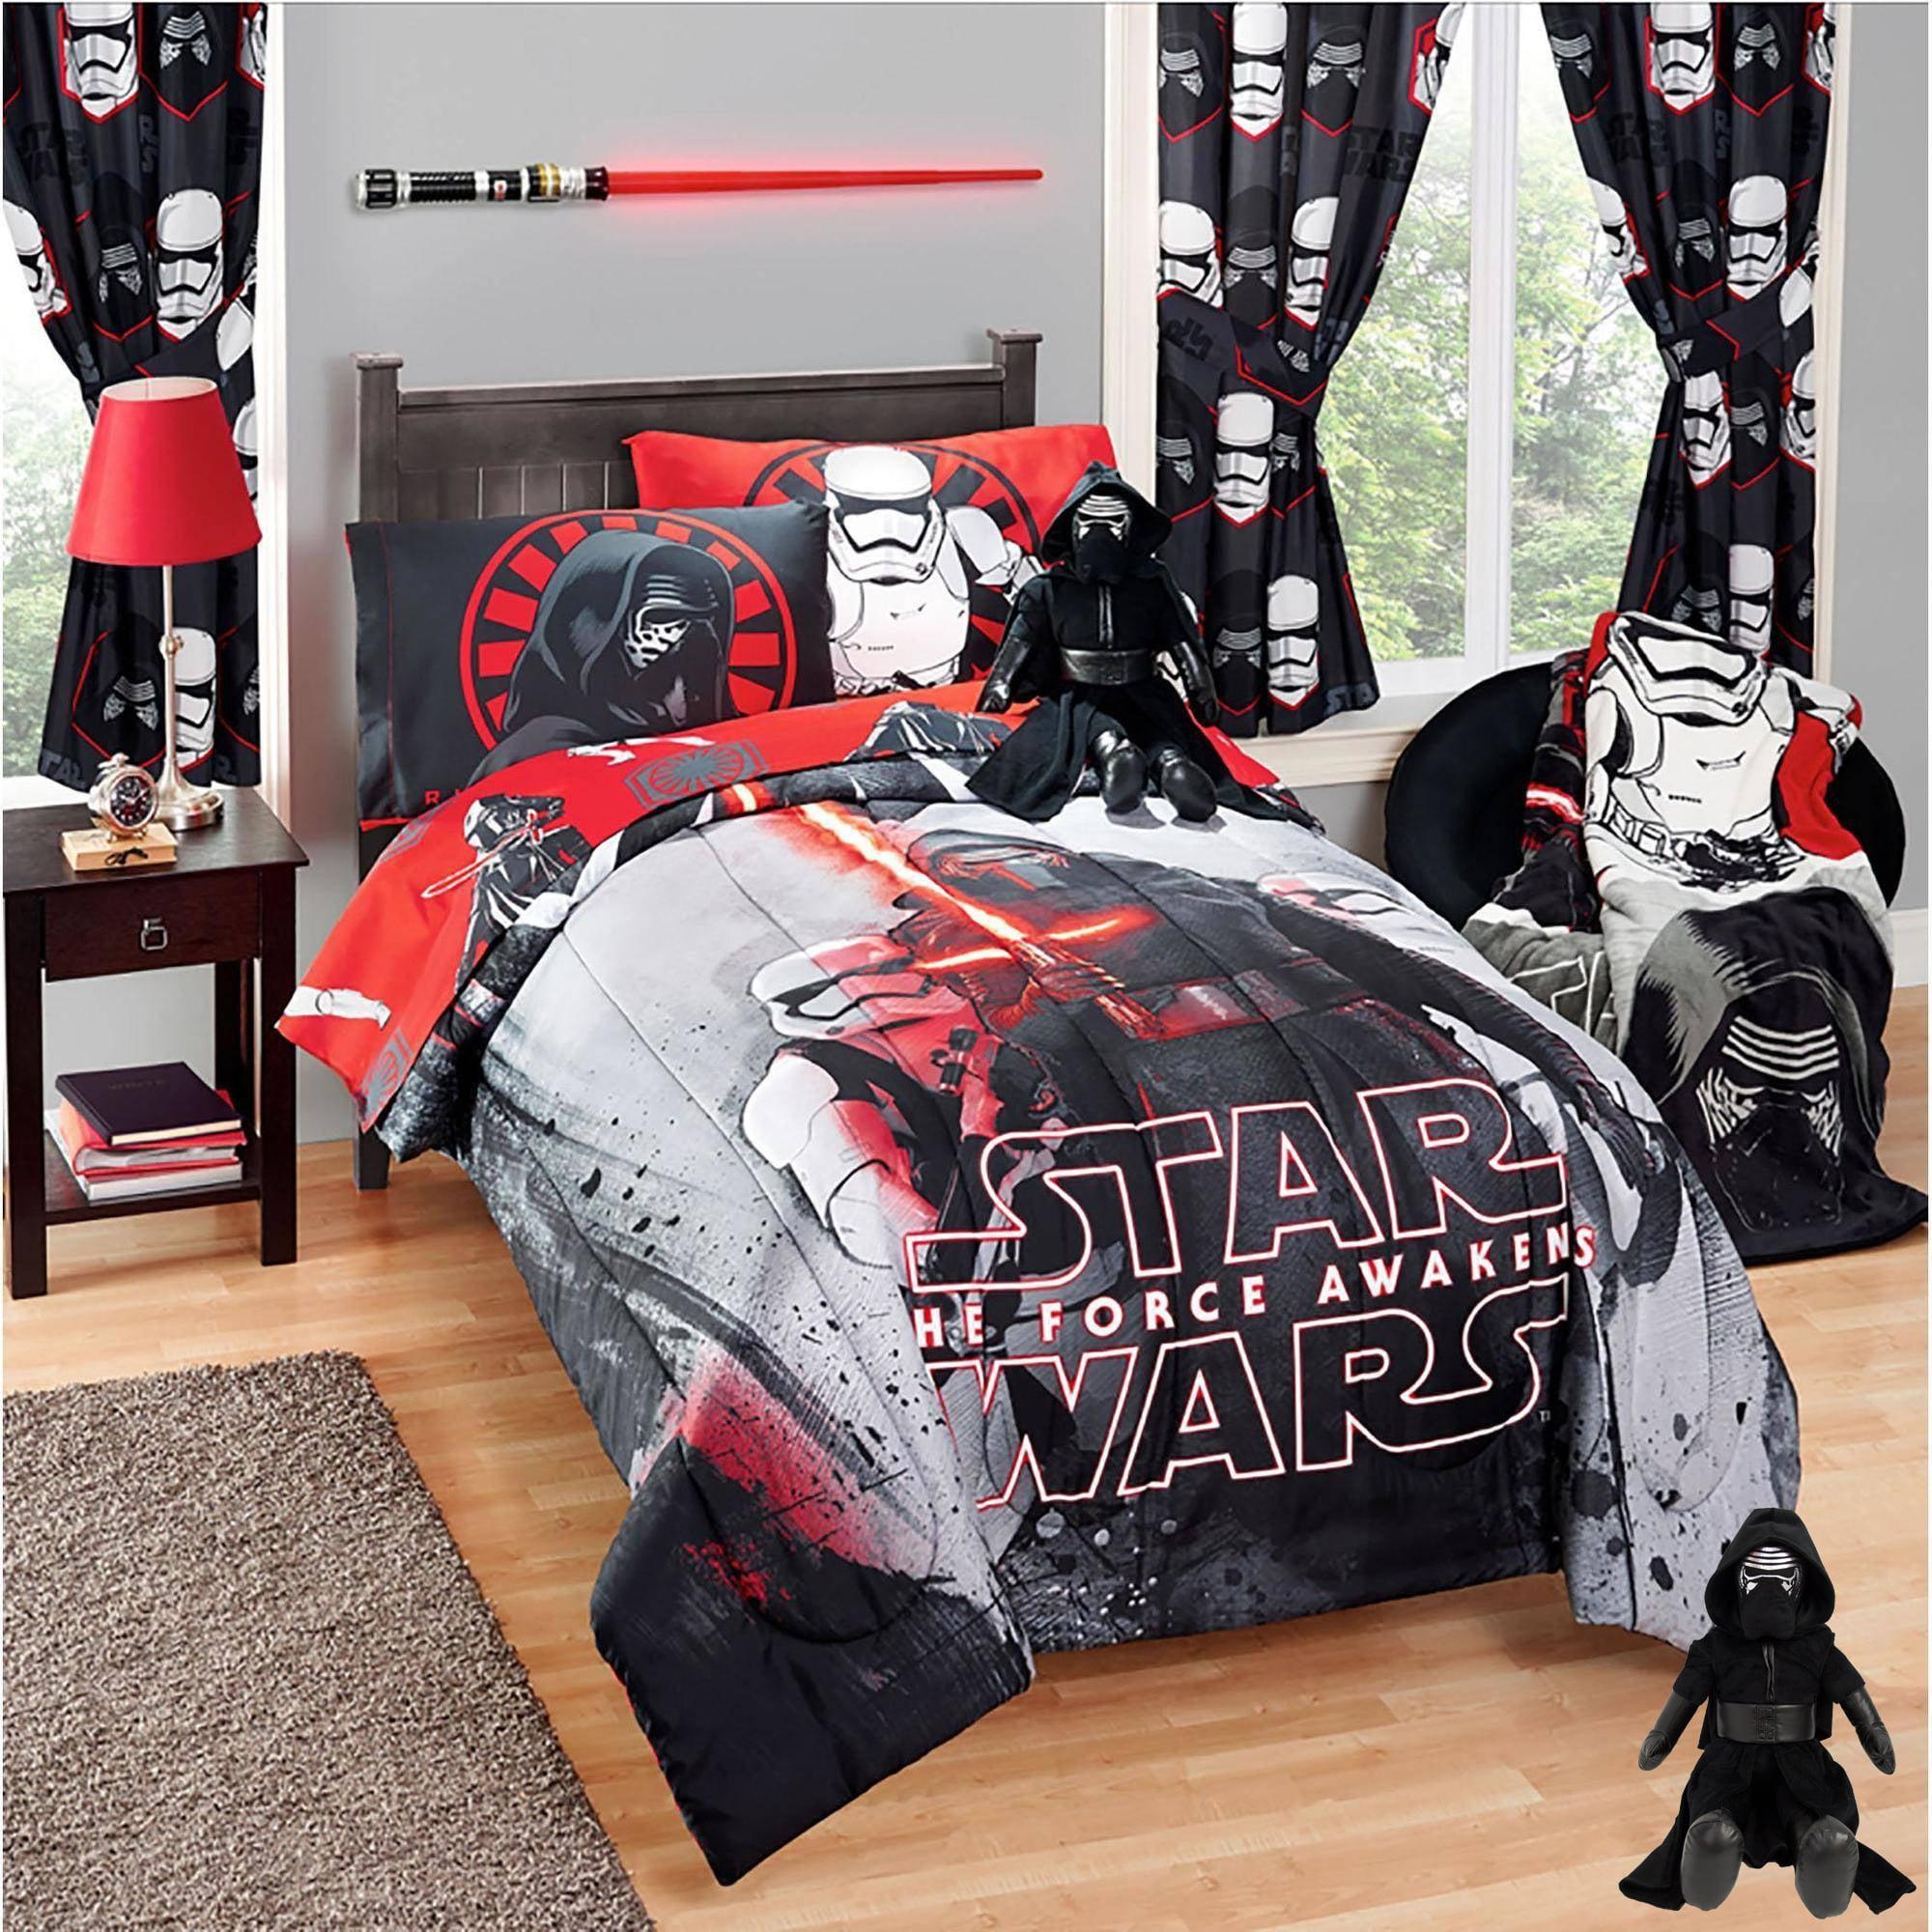 Star Wars Episode VII Comforter with BONUS Kylo Ren Pillow Buddy